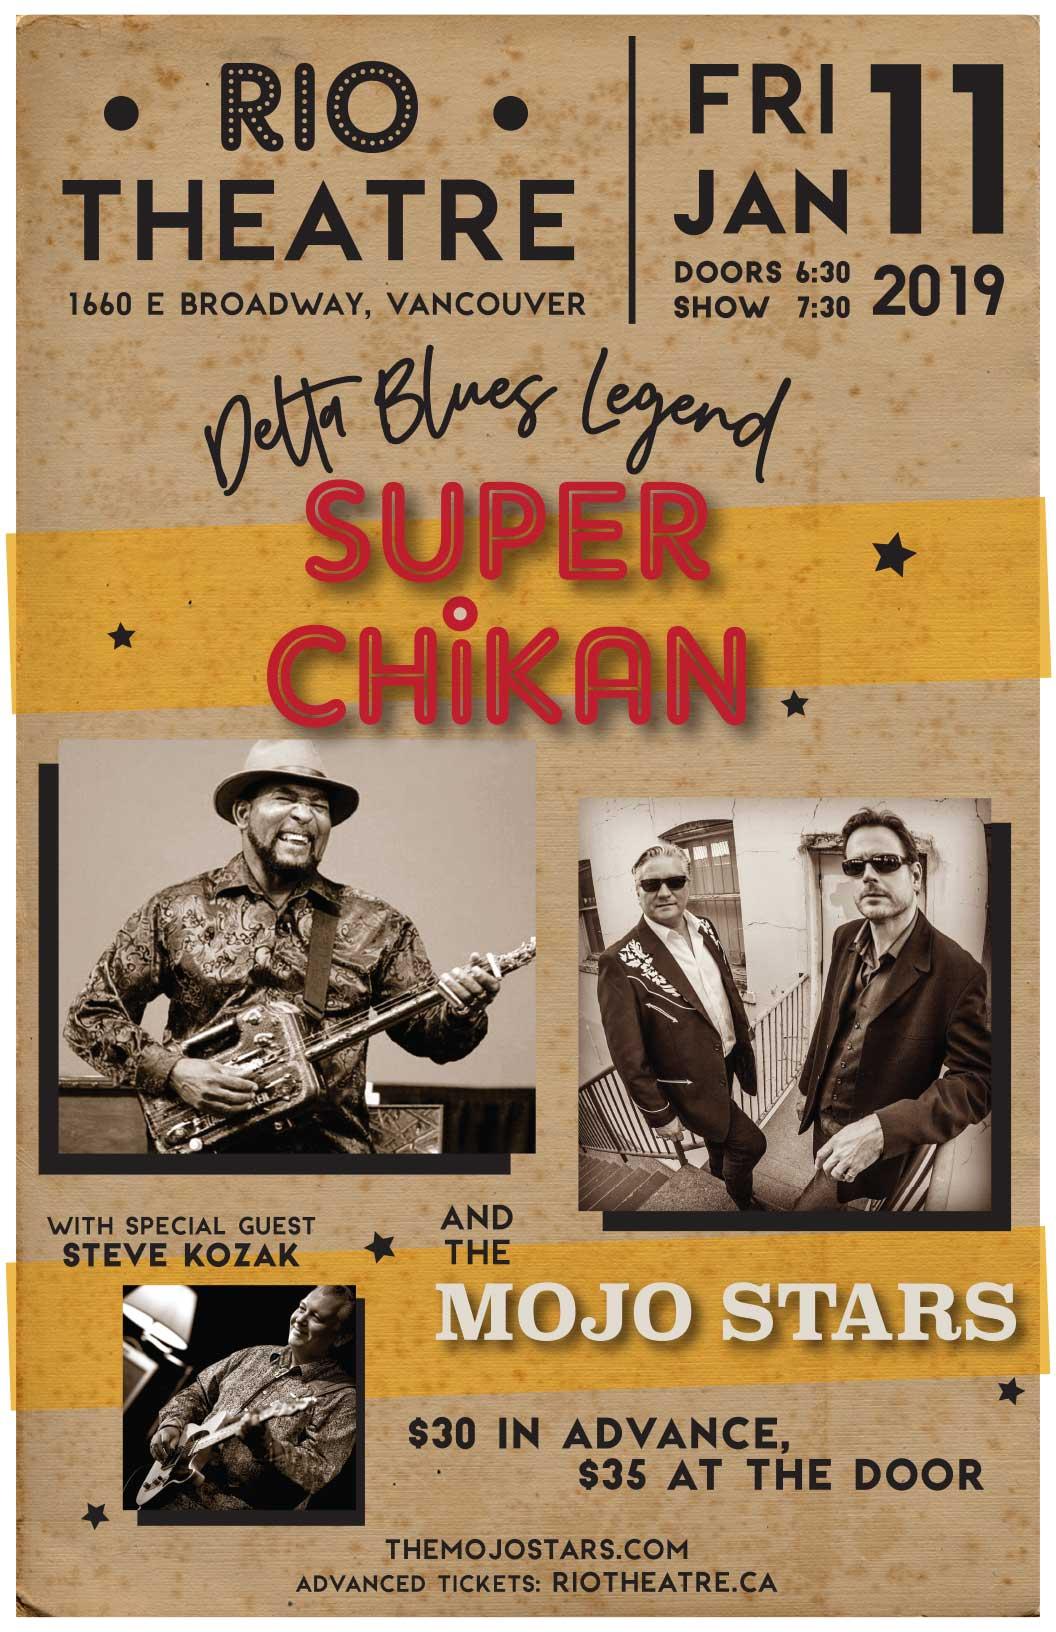 Super Chikan and The Mojo Stars